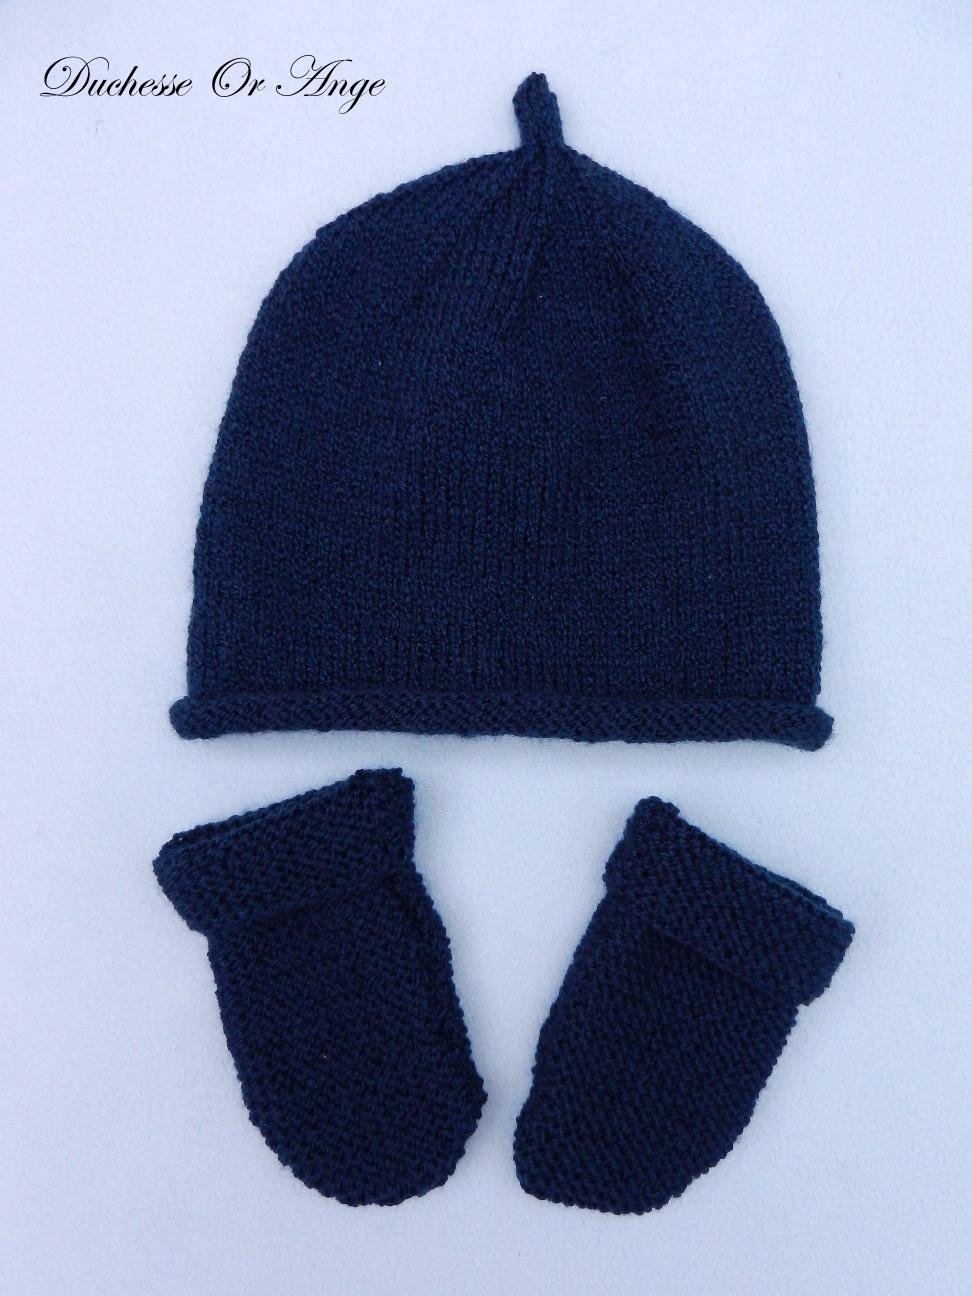 Doa 94 a bonnet et moufles bleu marine